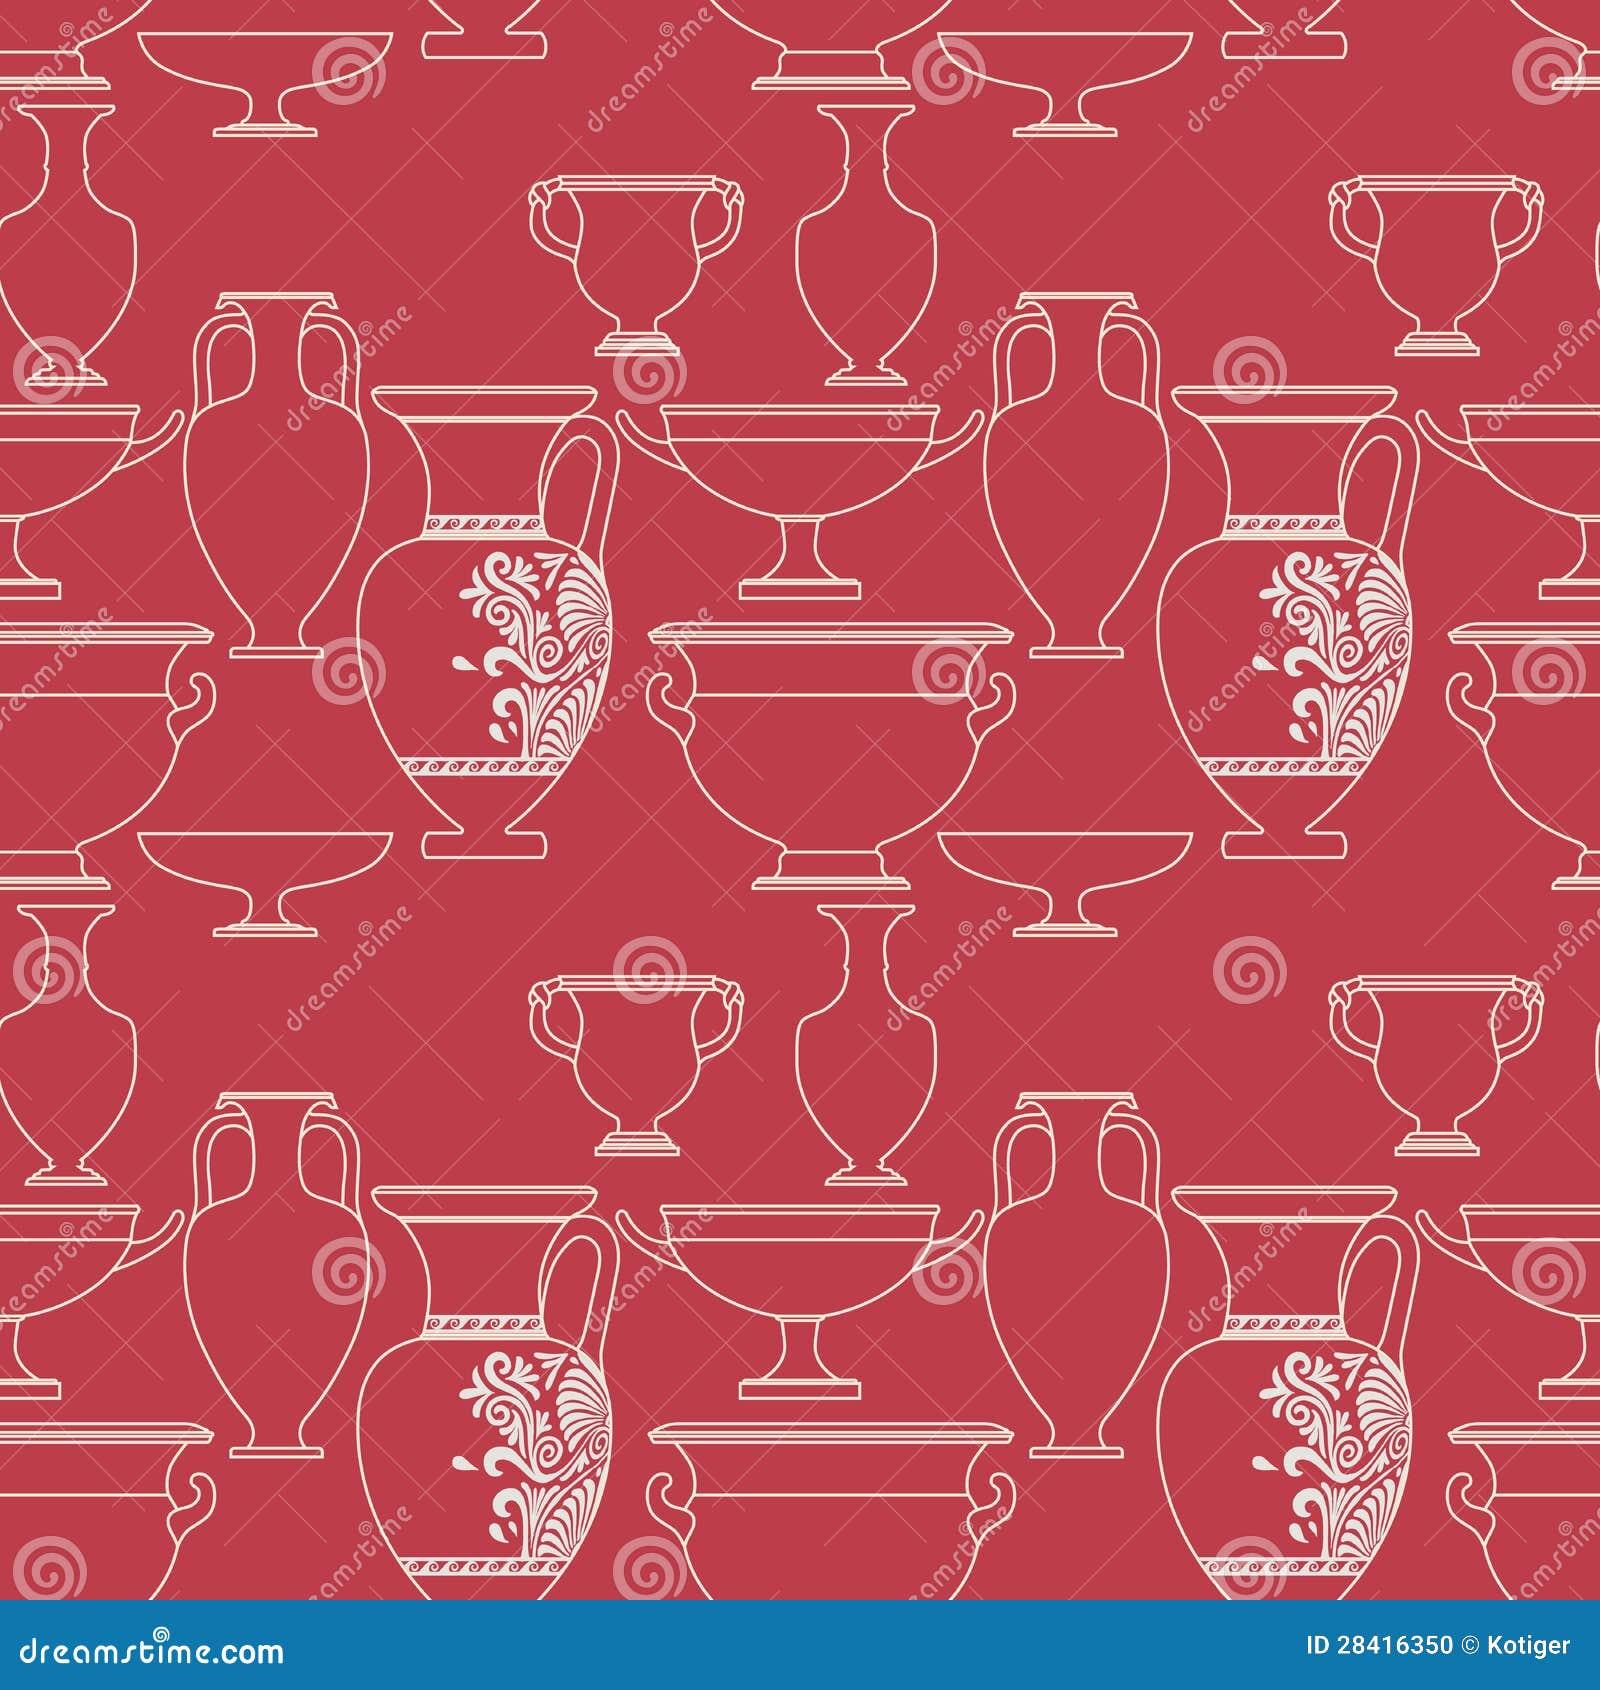 Ethnic National: Ceramic Ethnic National Greek Style Seamless Pattern Stock